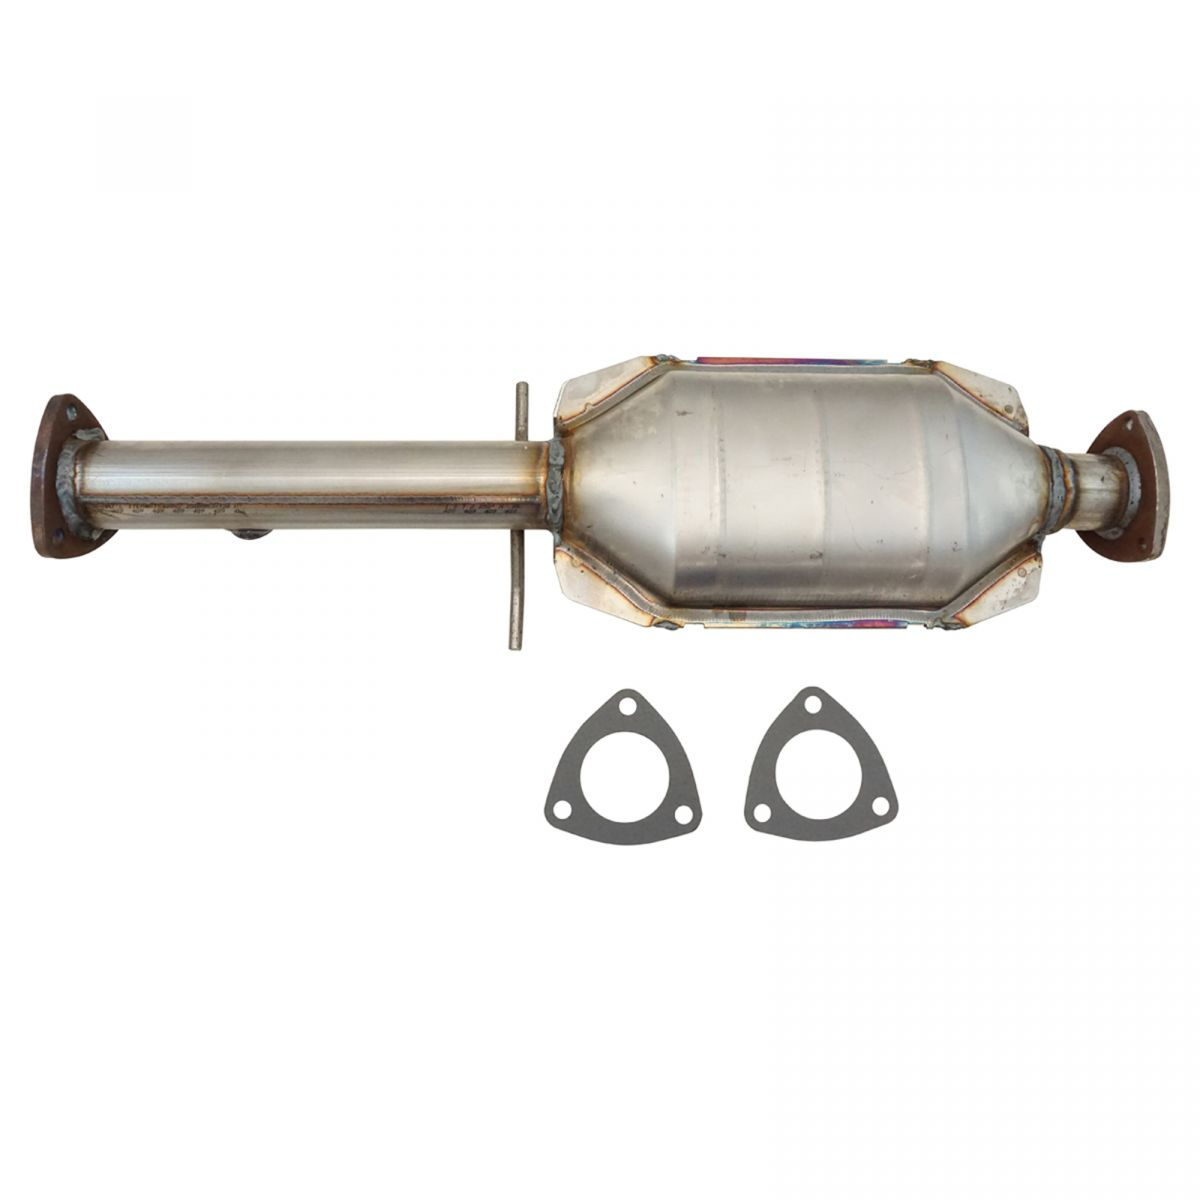 EPA Catalytic Converter Fits 2001 GMC Sonoma 2.2L L4 FLEX OHV